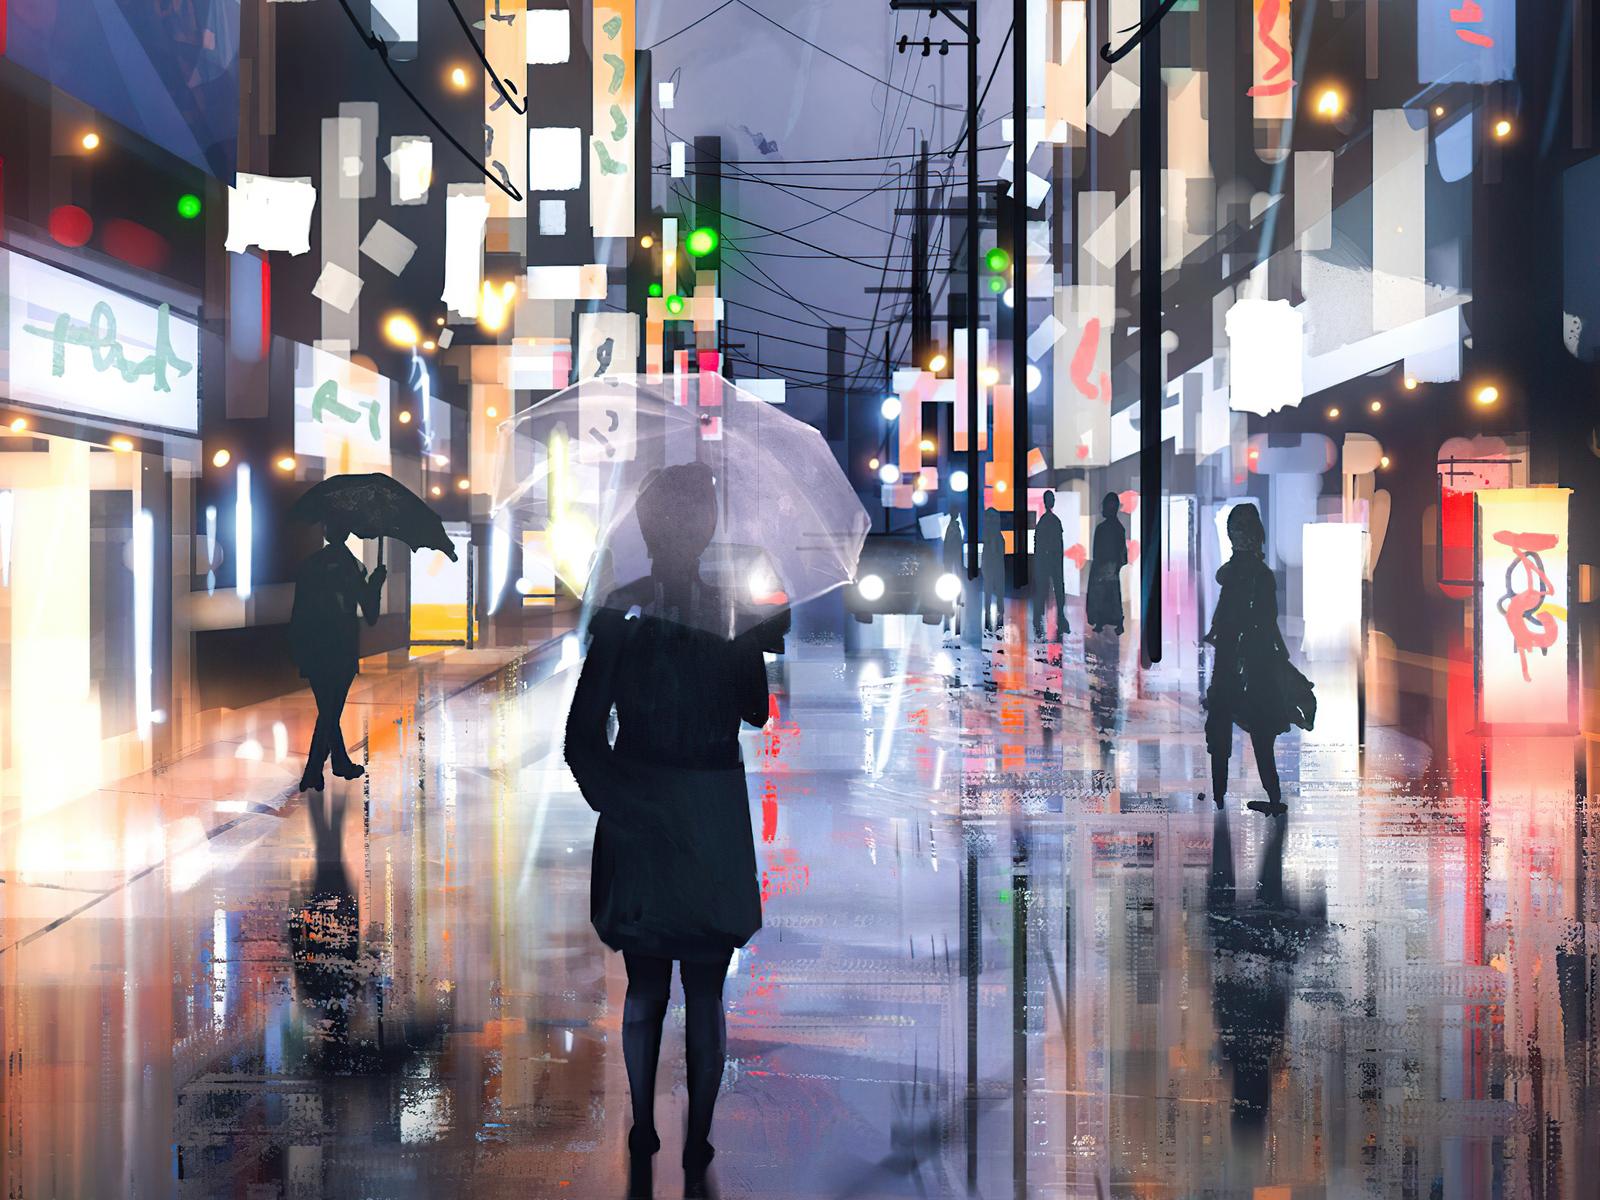 street-raining-umbrella-girl-4k-cs.jpg